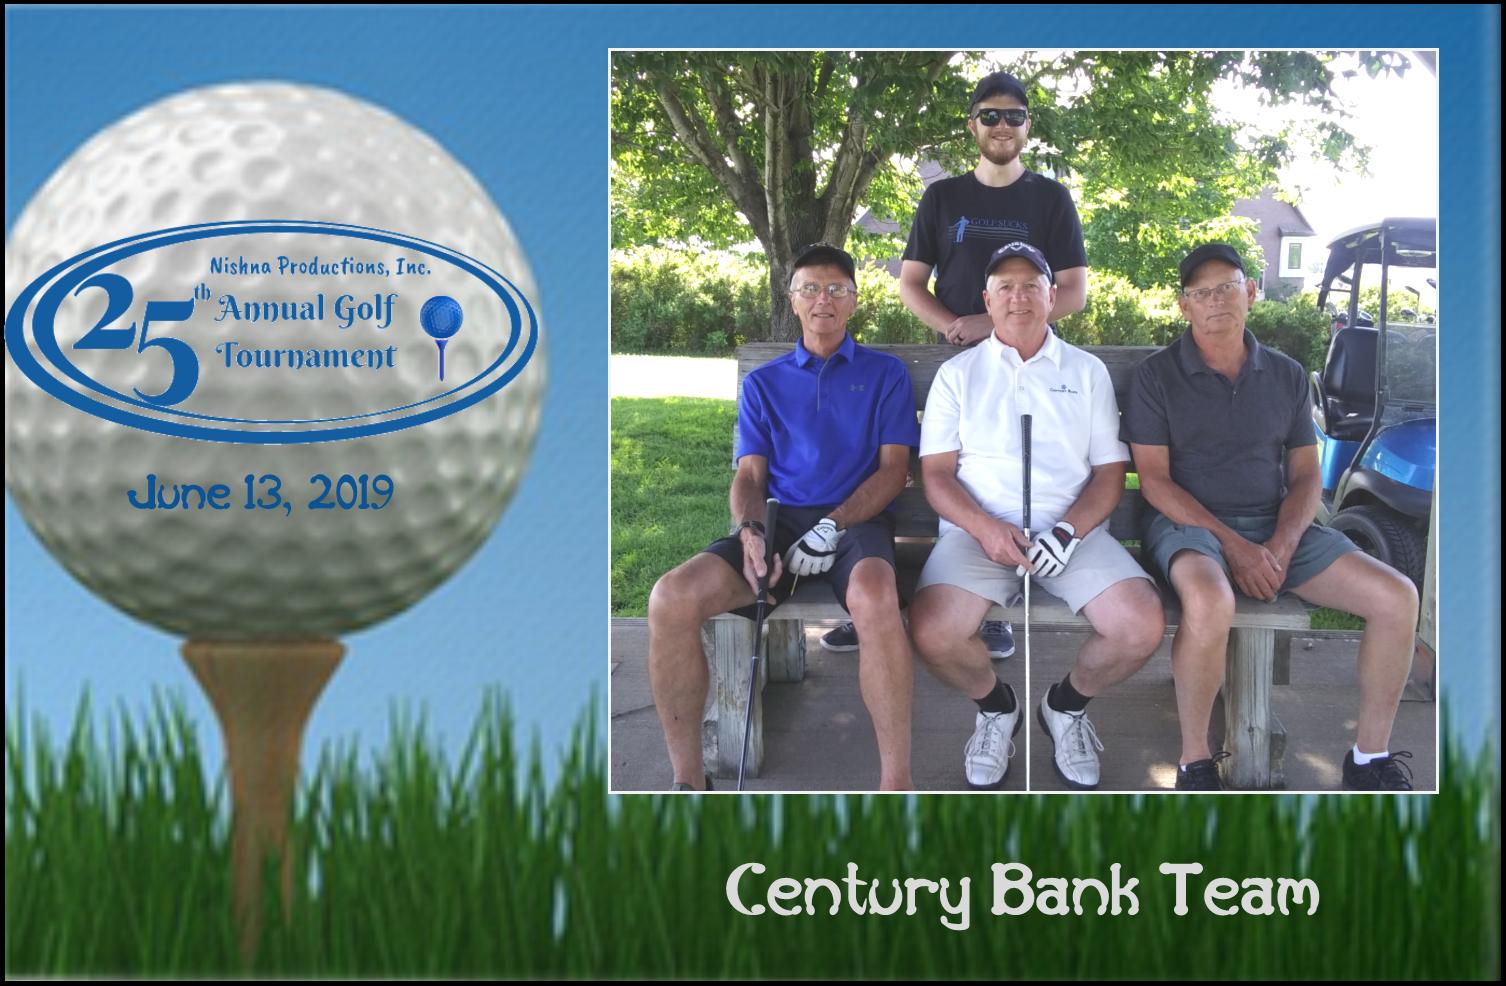 Century Bank Team